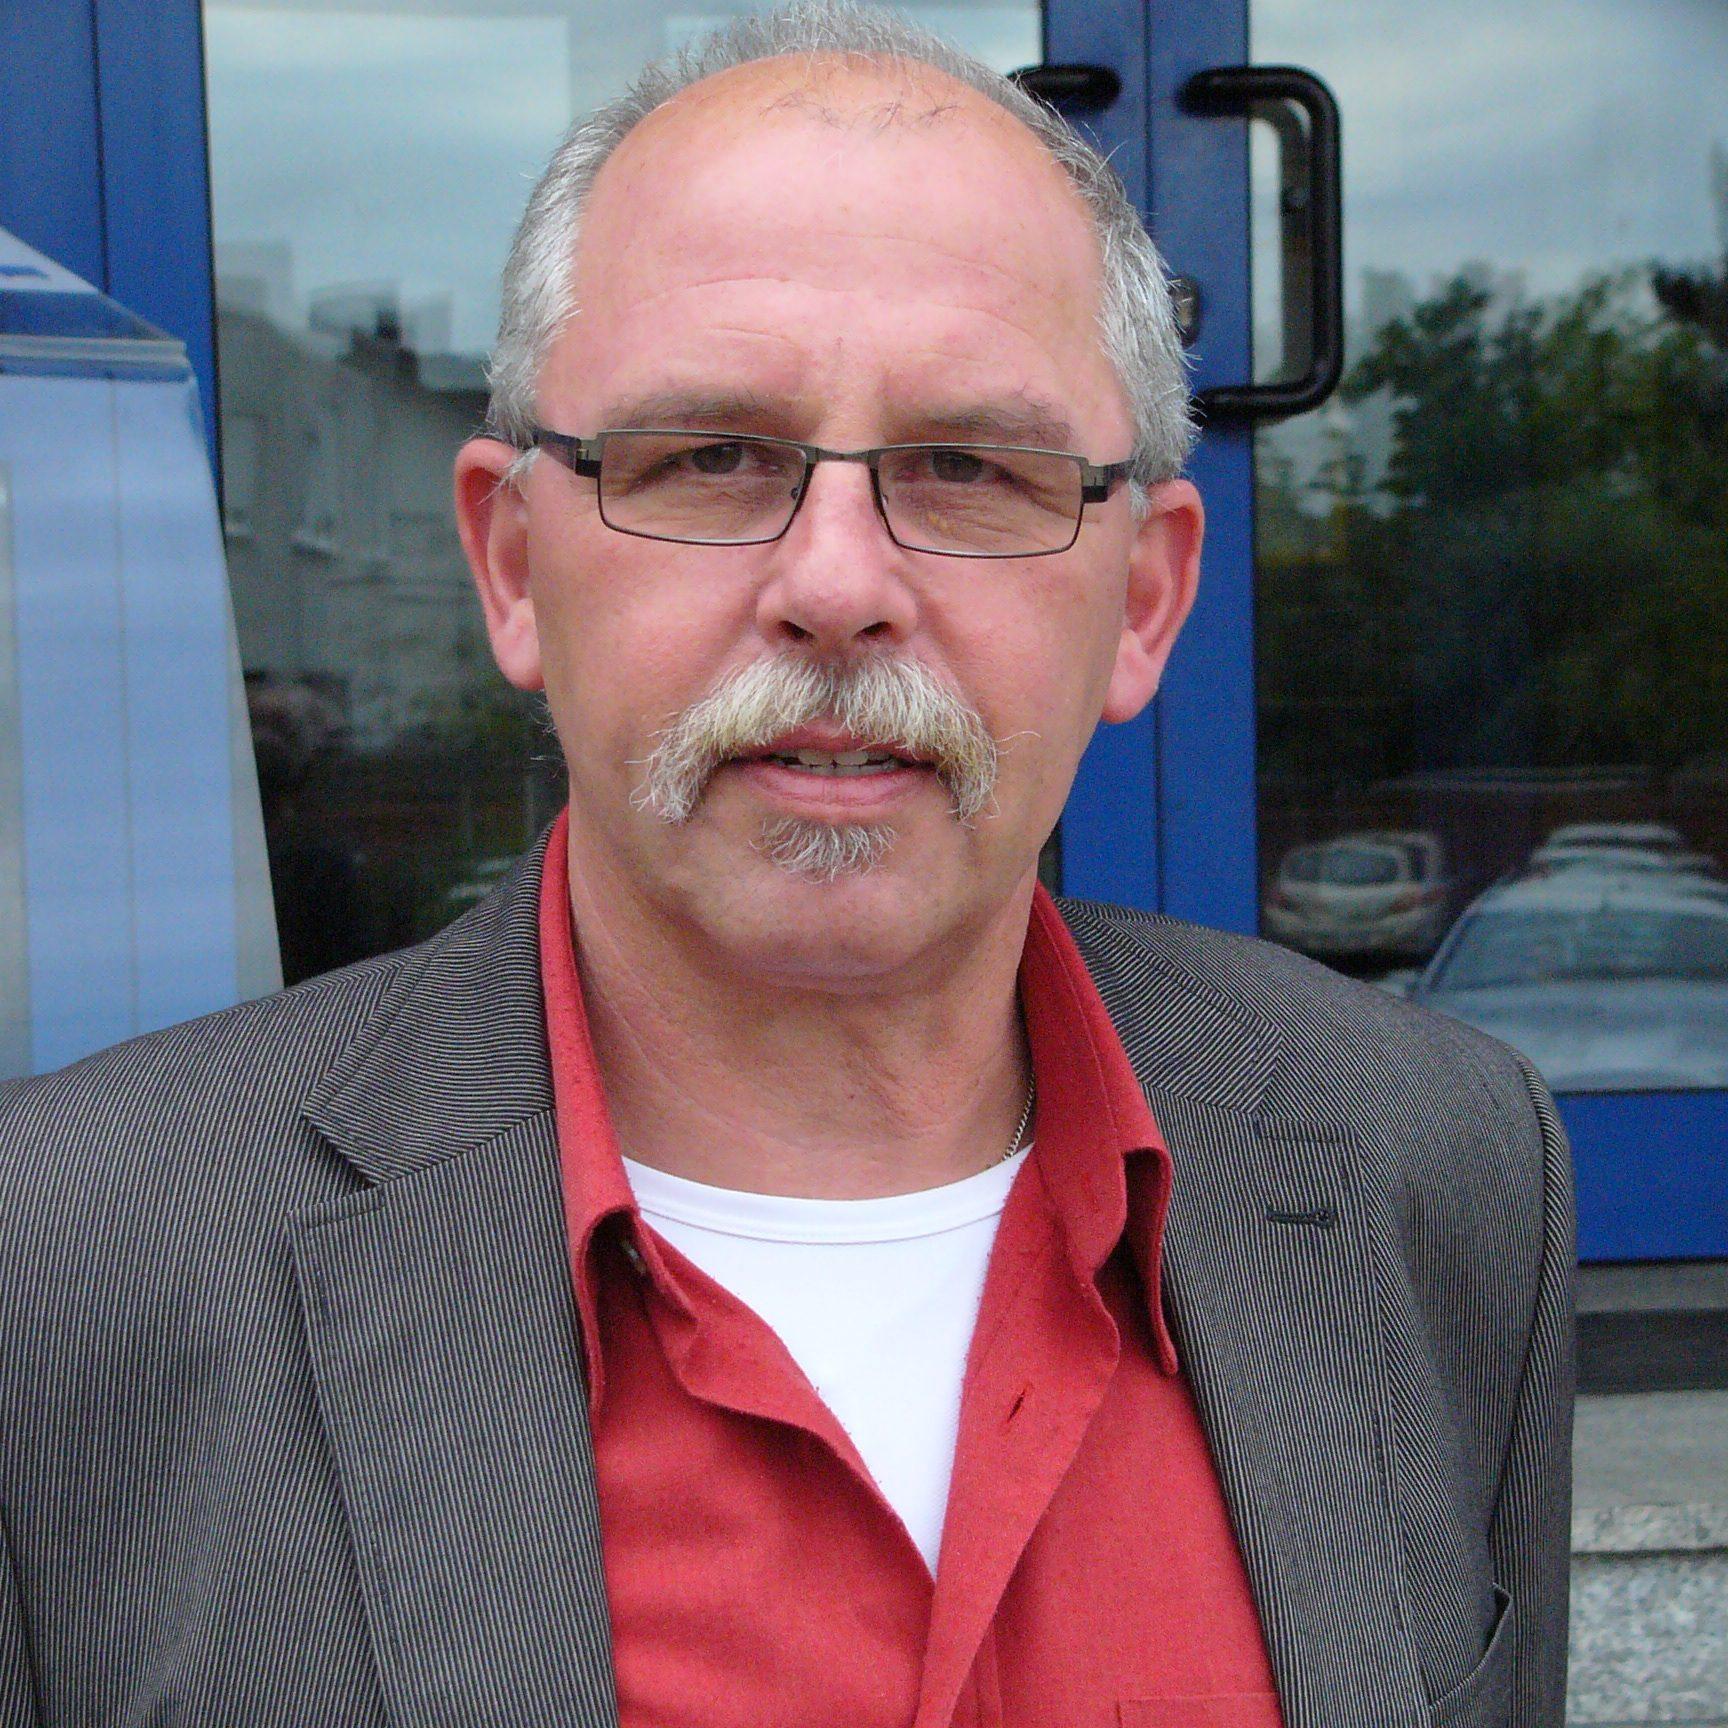 Ralf Eloo, Sprecher der SPD-Kreistagsfraktion im Jugendhilfeausschuss